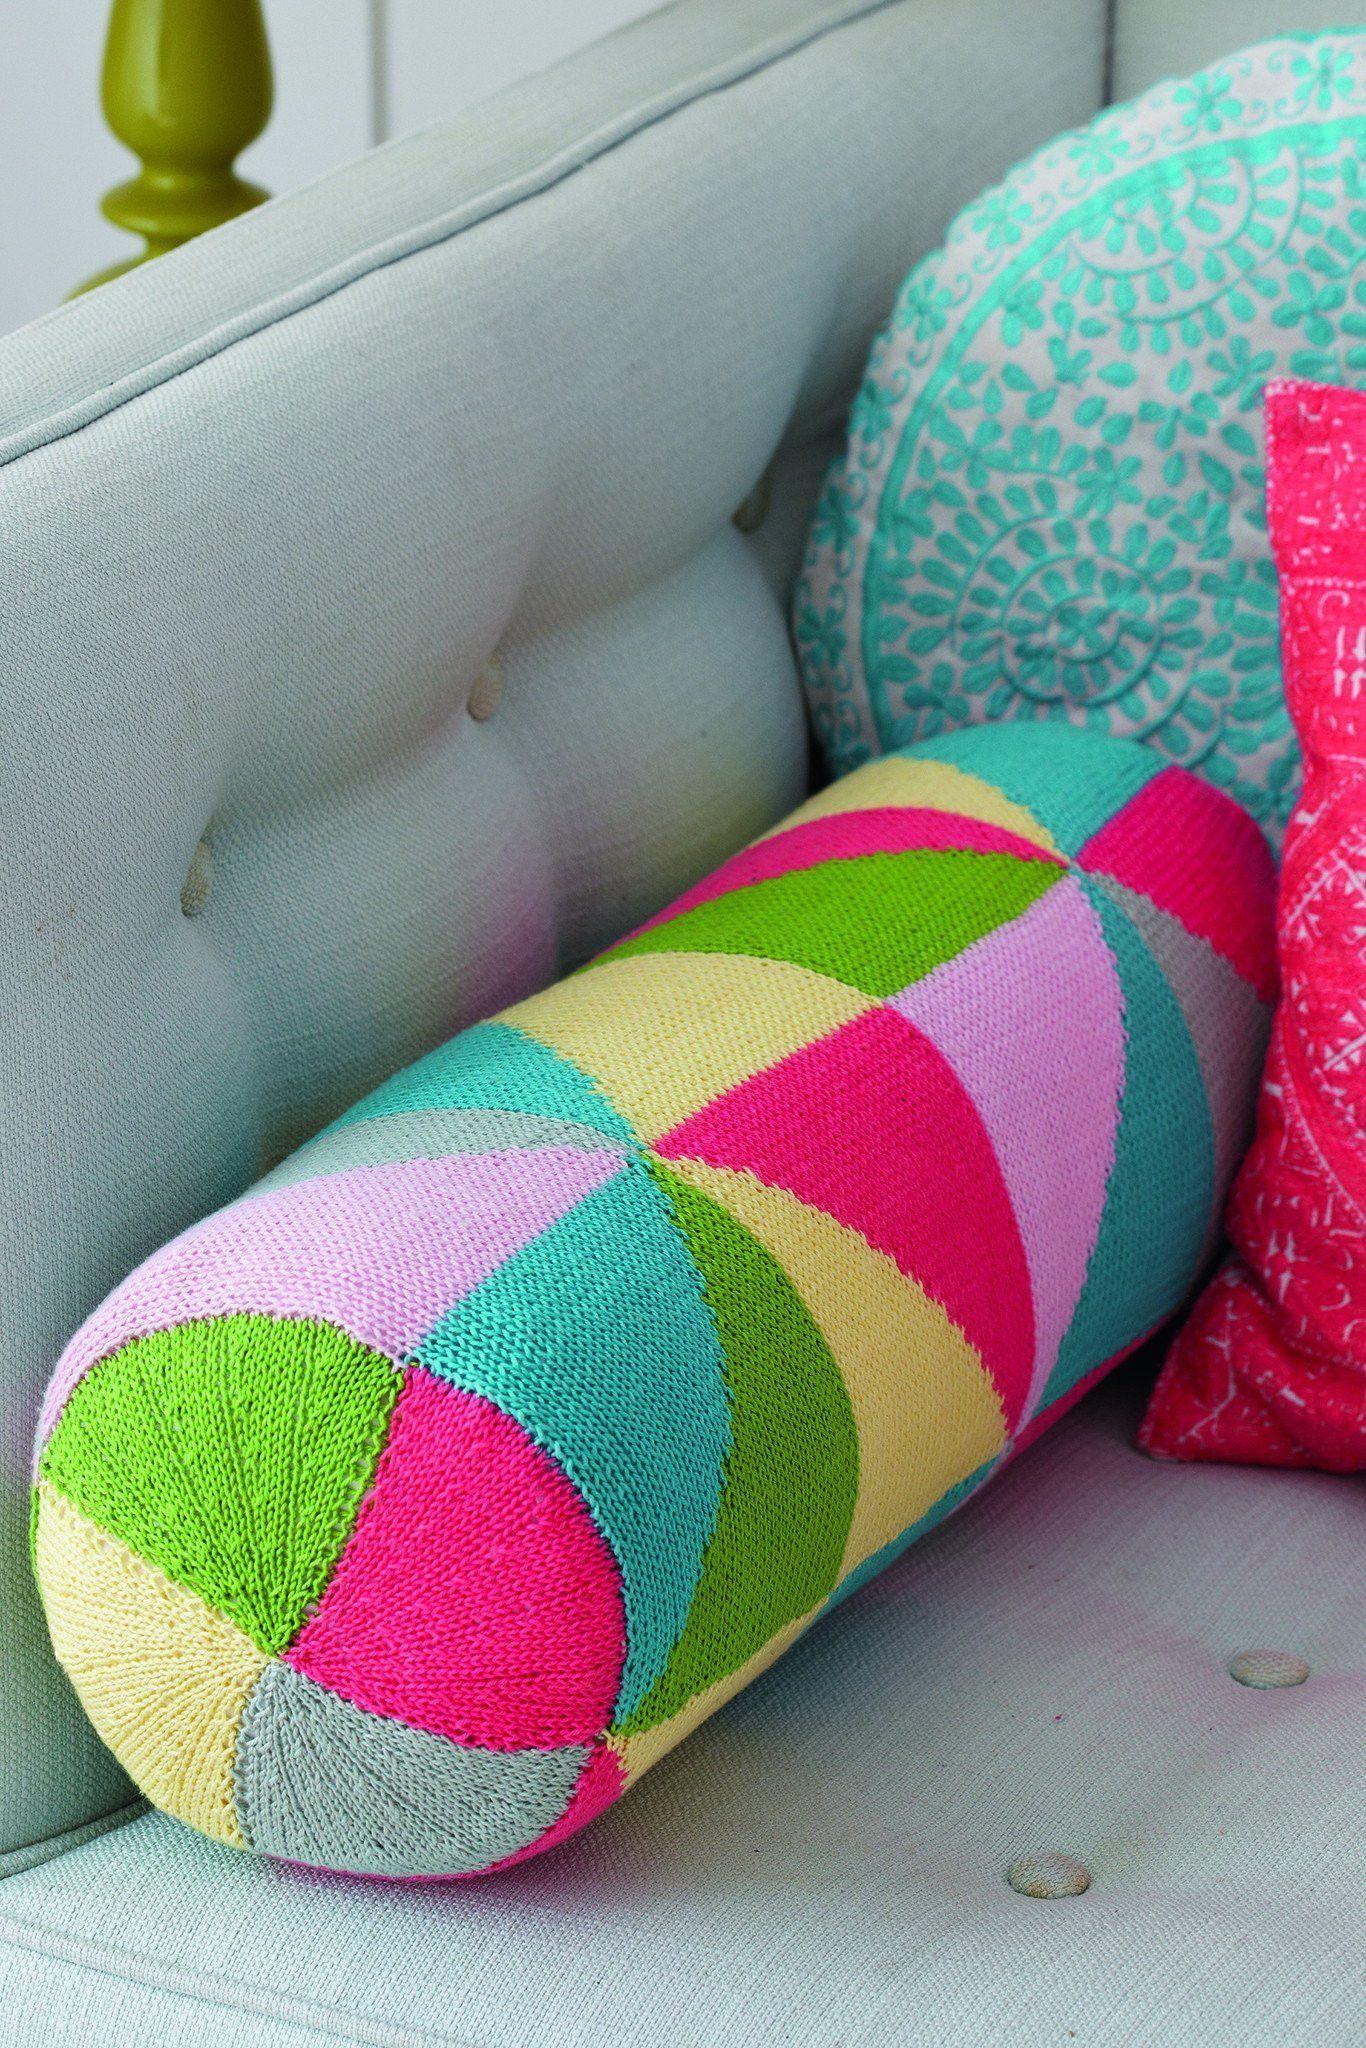 Geometric Bolster Cushion Cover Knitting Pattern | The ...